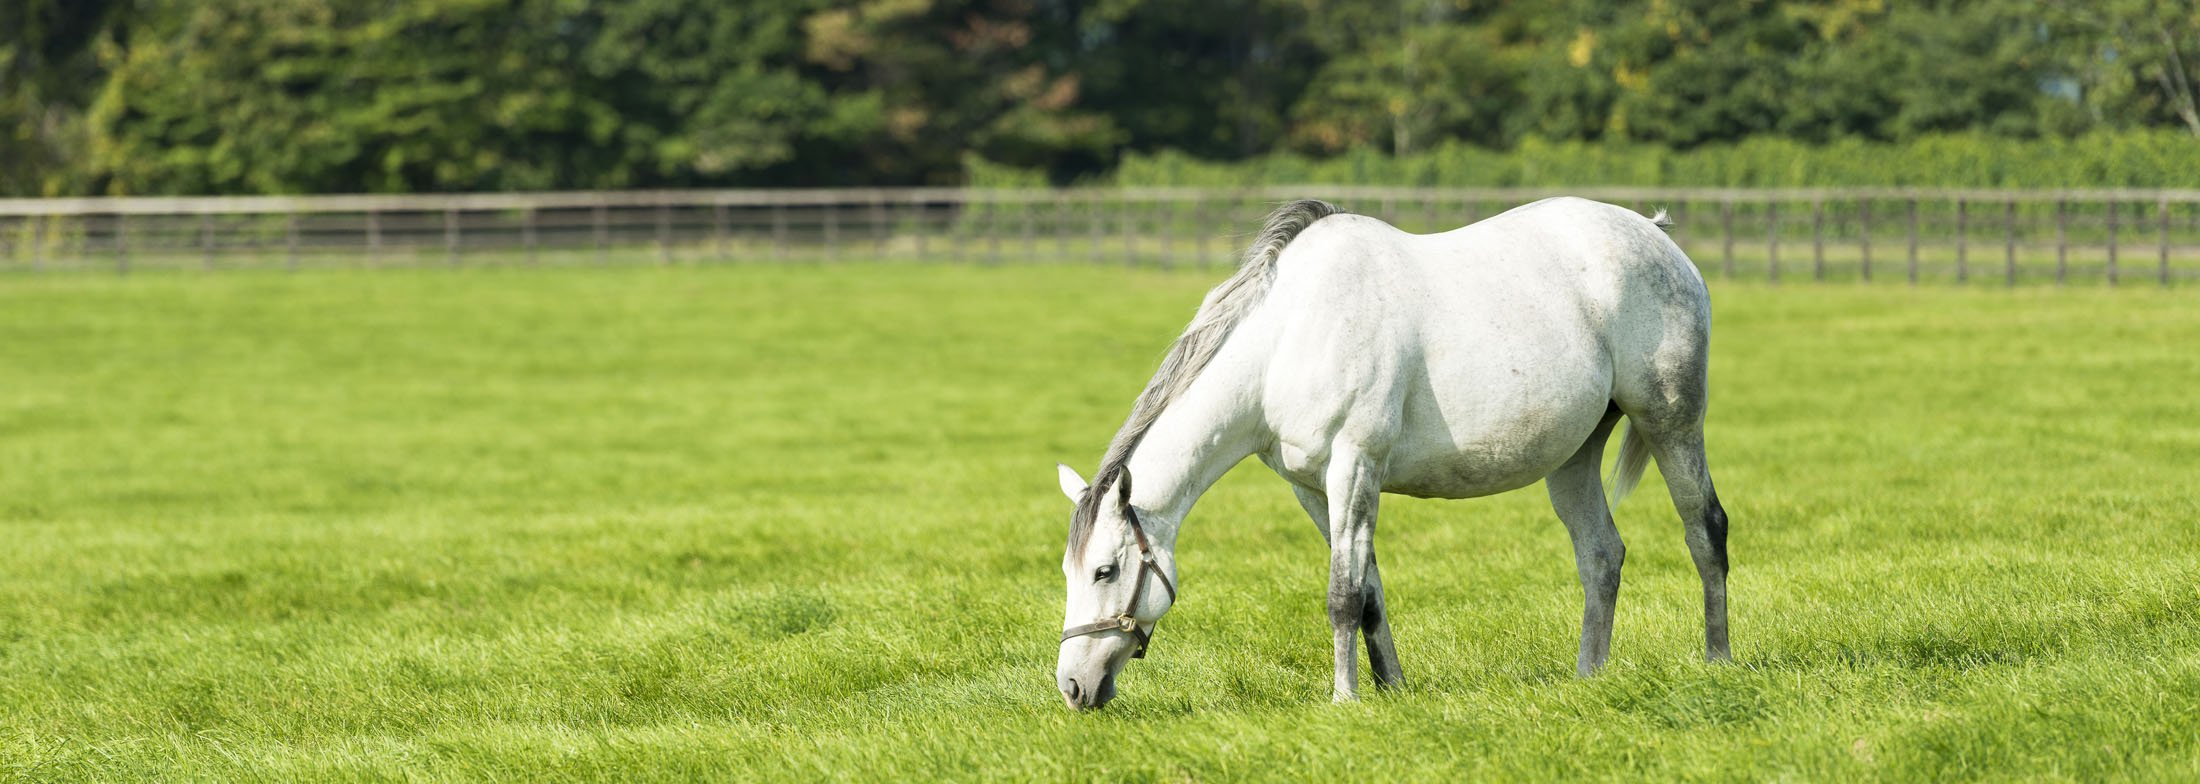 equineslider7-1